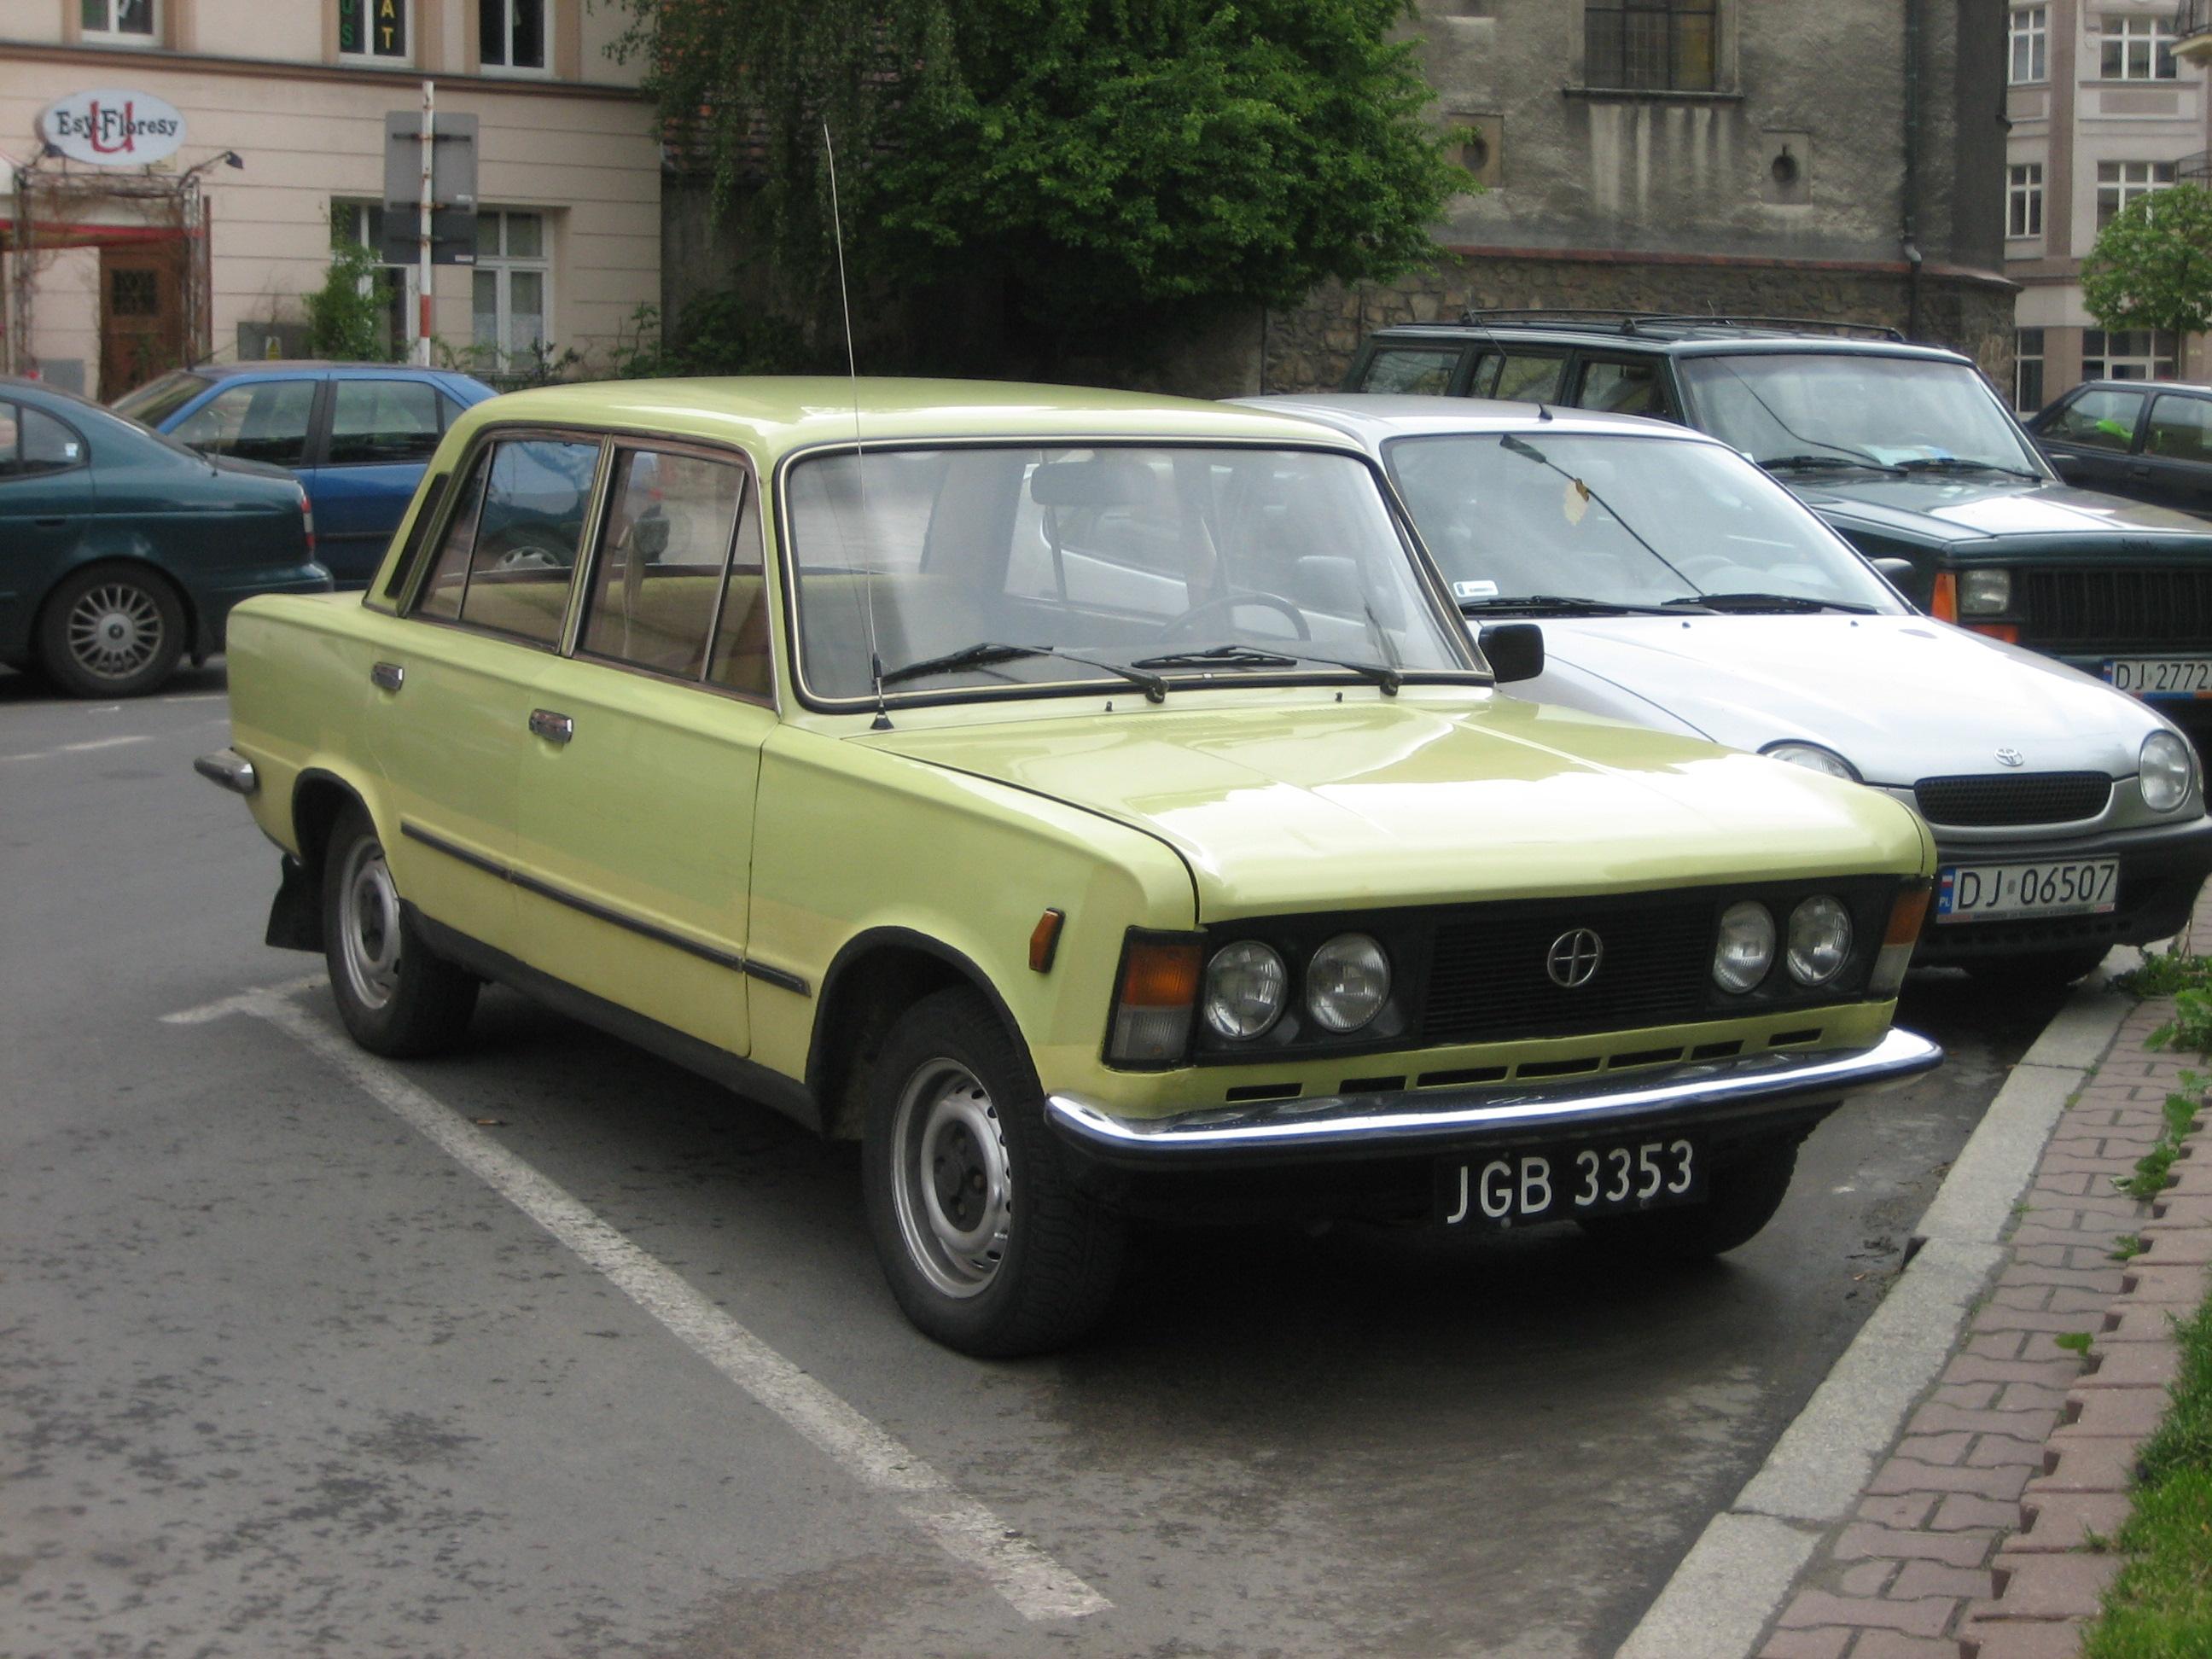 Polski_Fiat_125p_yellow.jpg